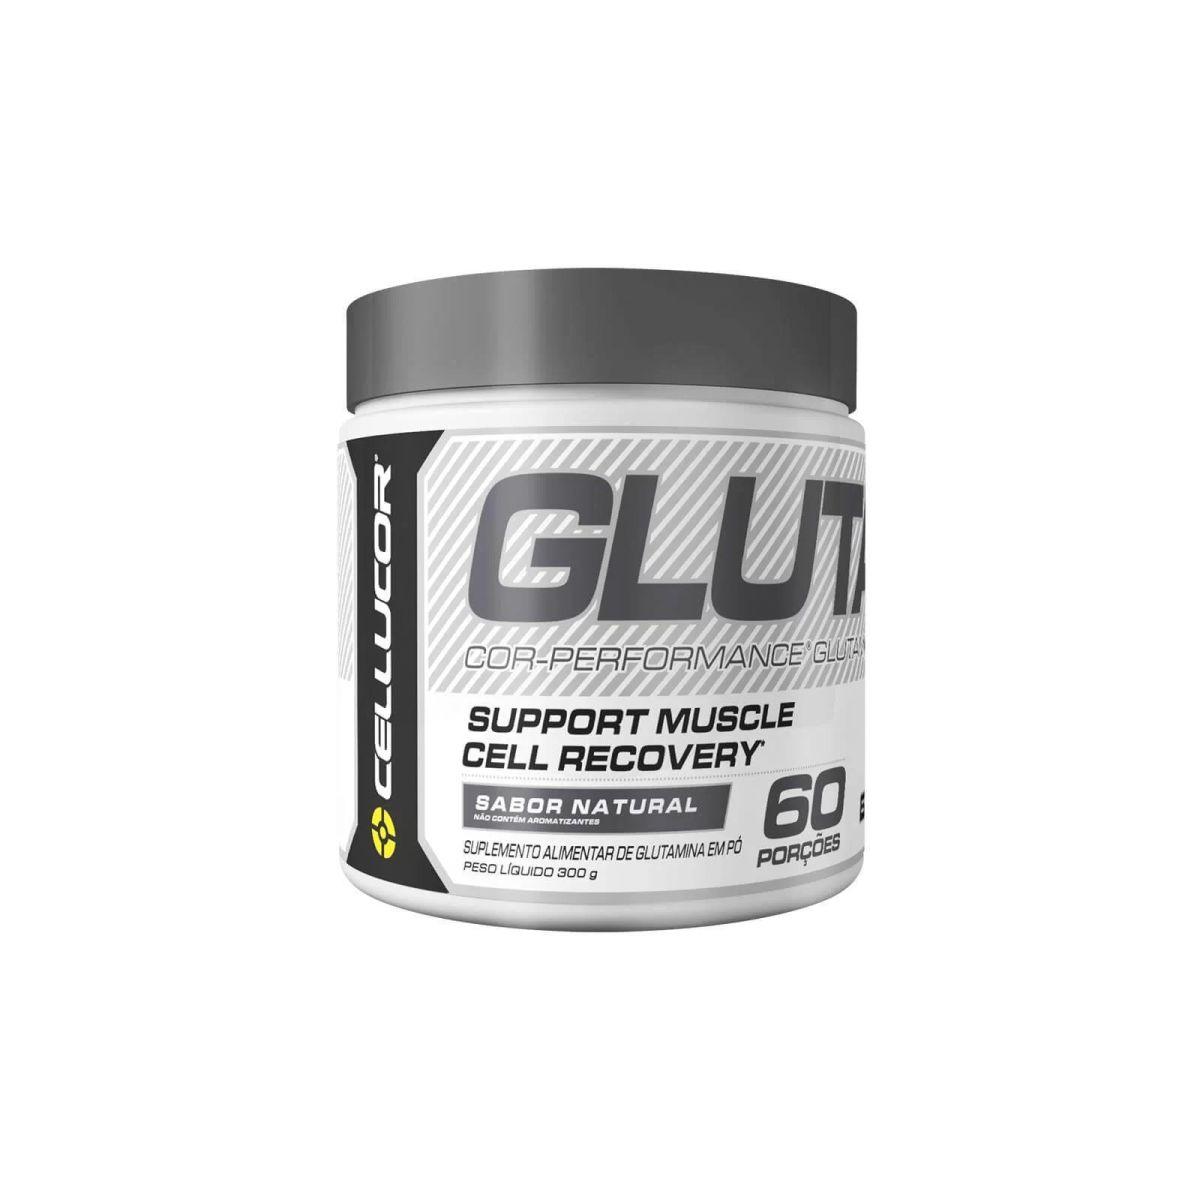 Glutamina Cor-Performance 300g 60 Doses - Cellucor